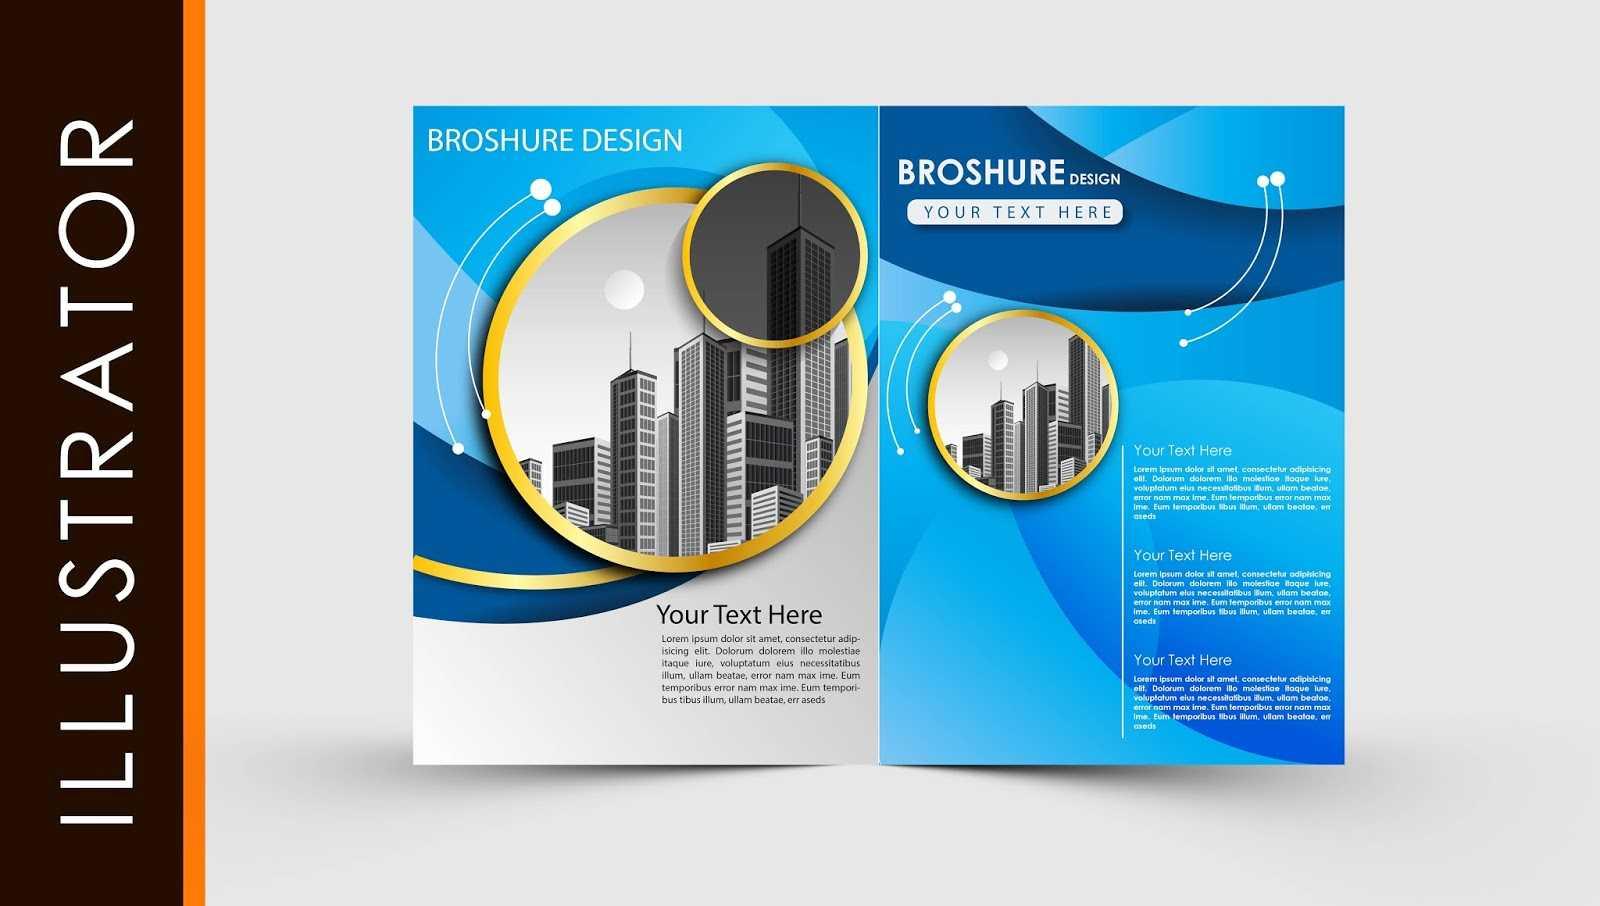 Free Download Adobe Illustrator Template Brochure Two Fold With Brochure Template Illustrator Free Download